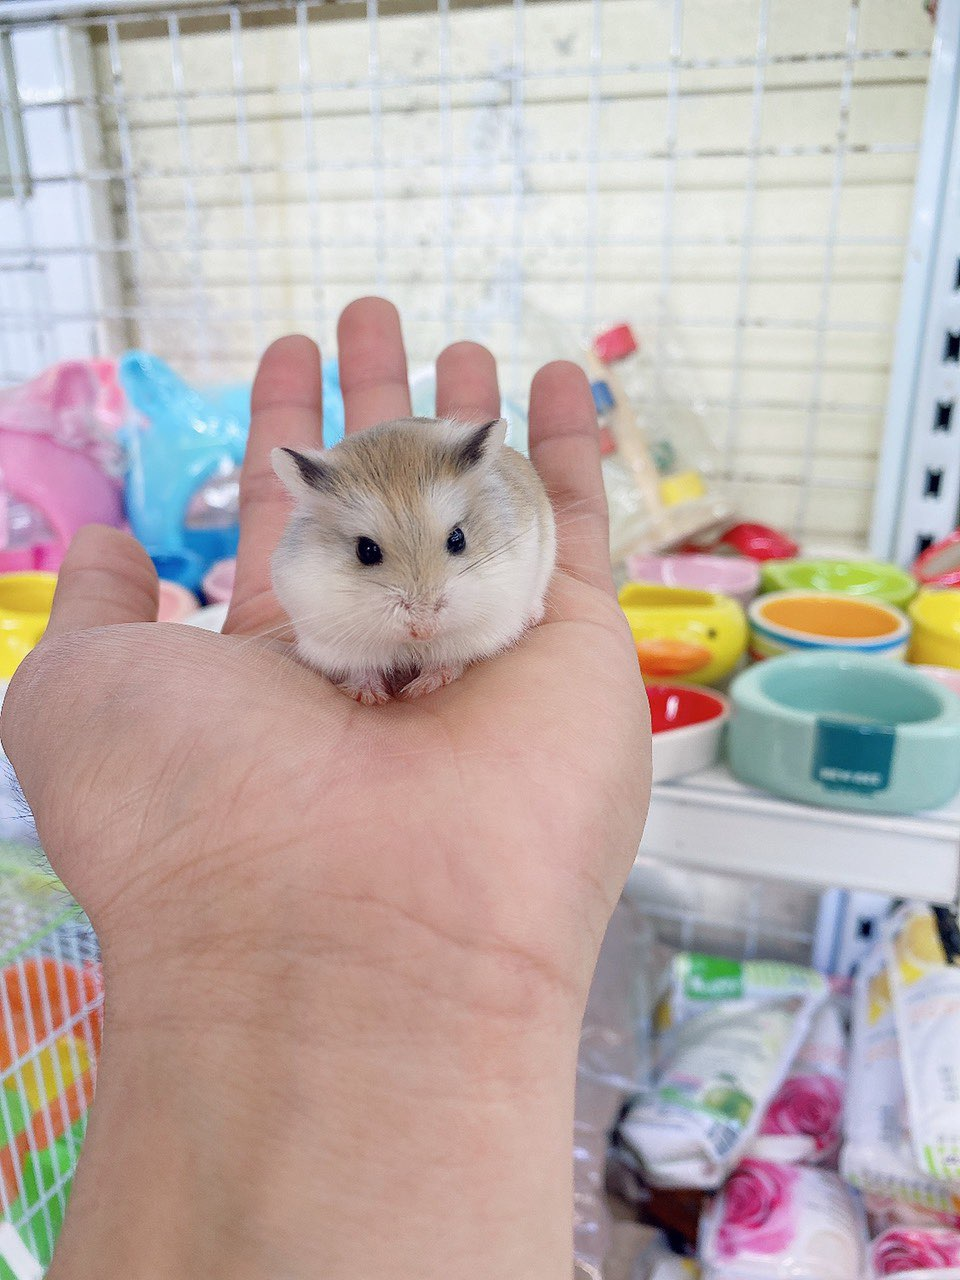 Hamster robo mặt nâu